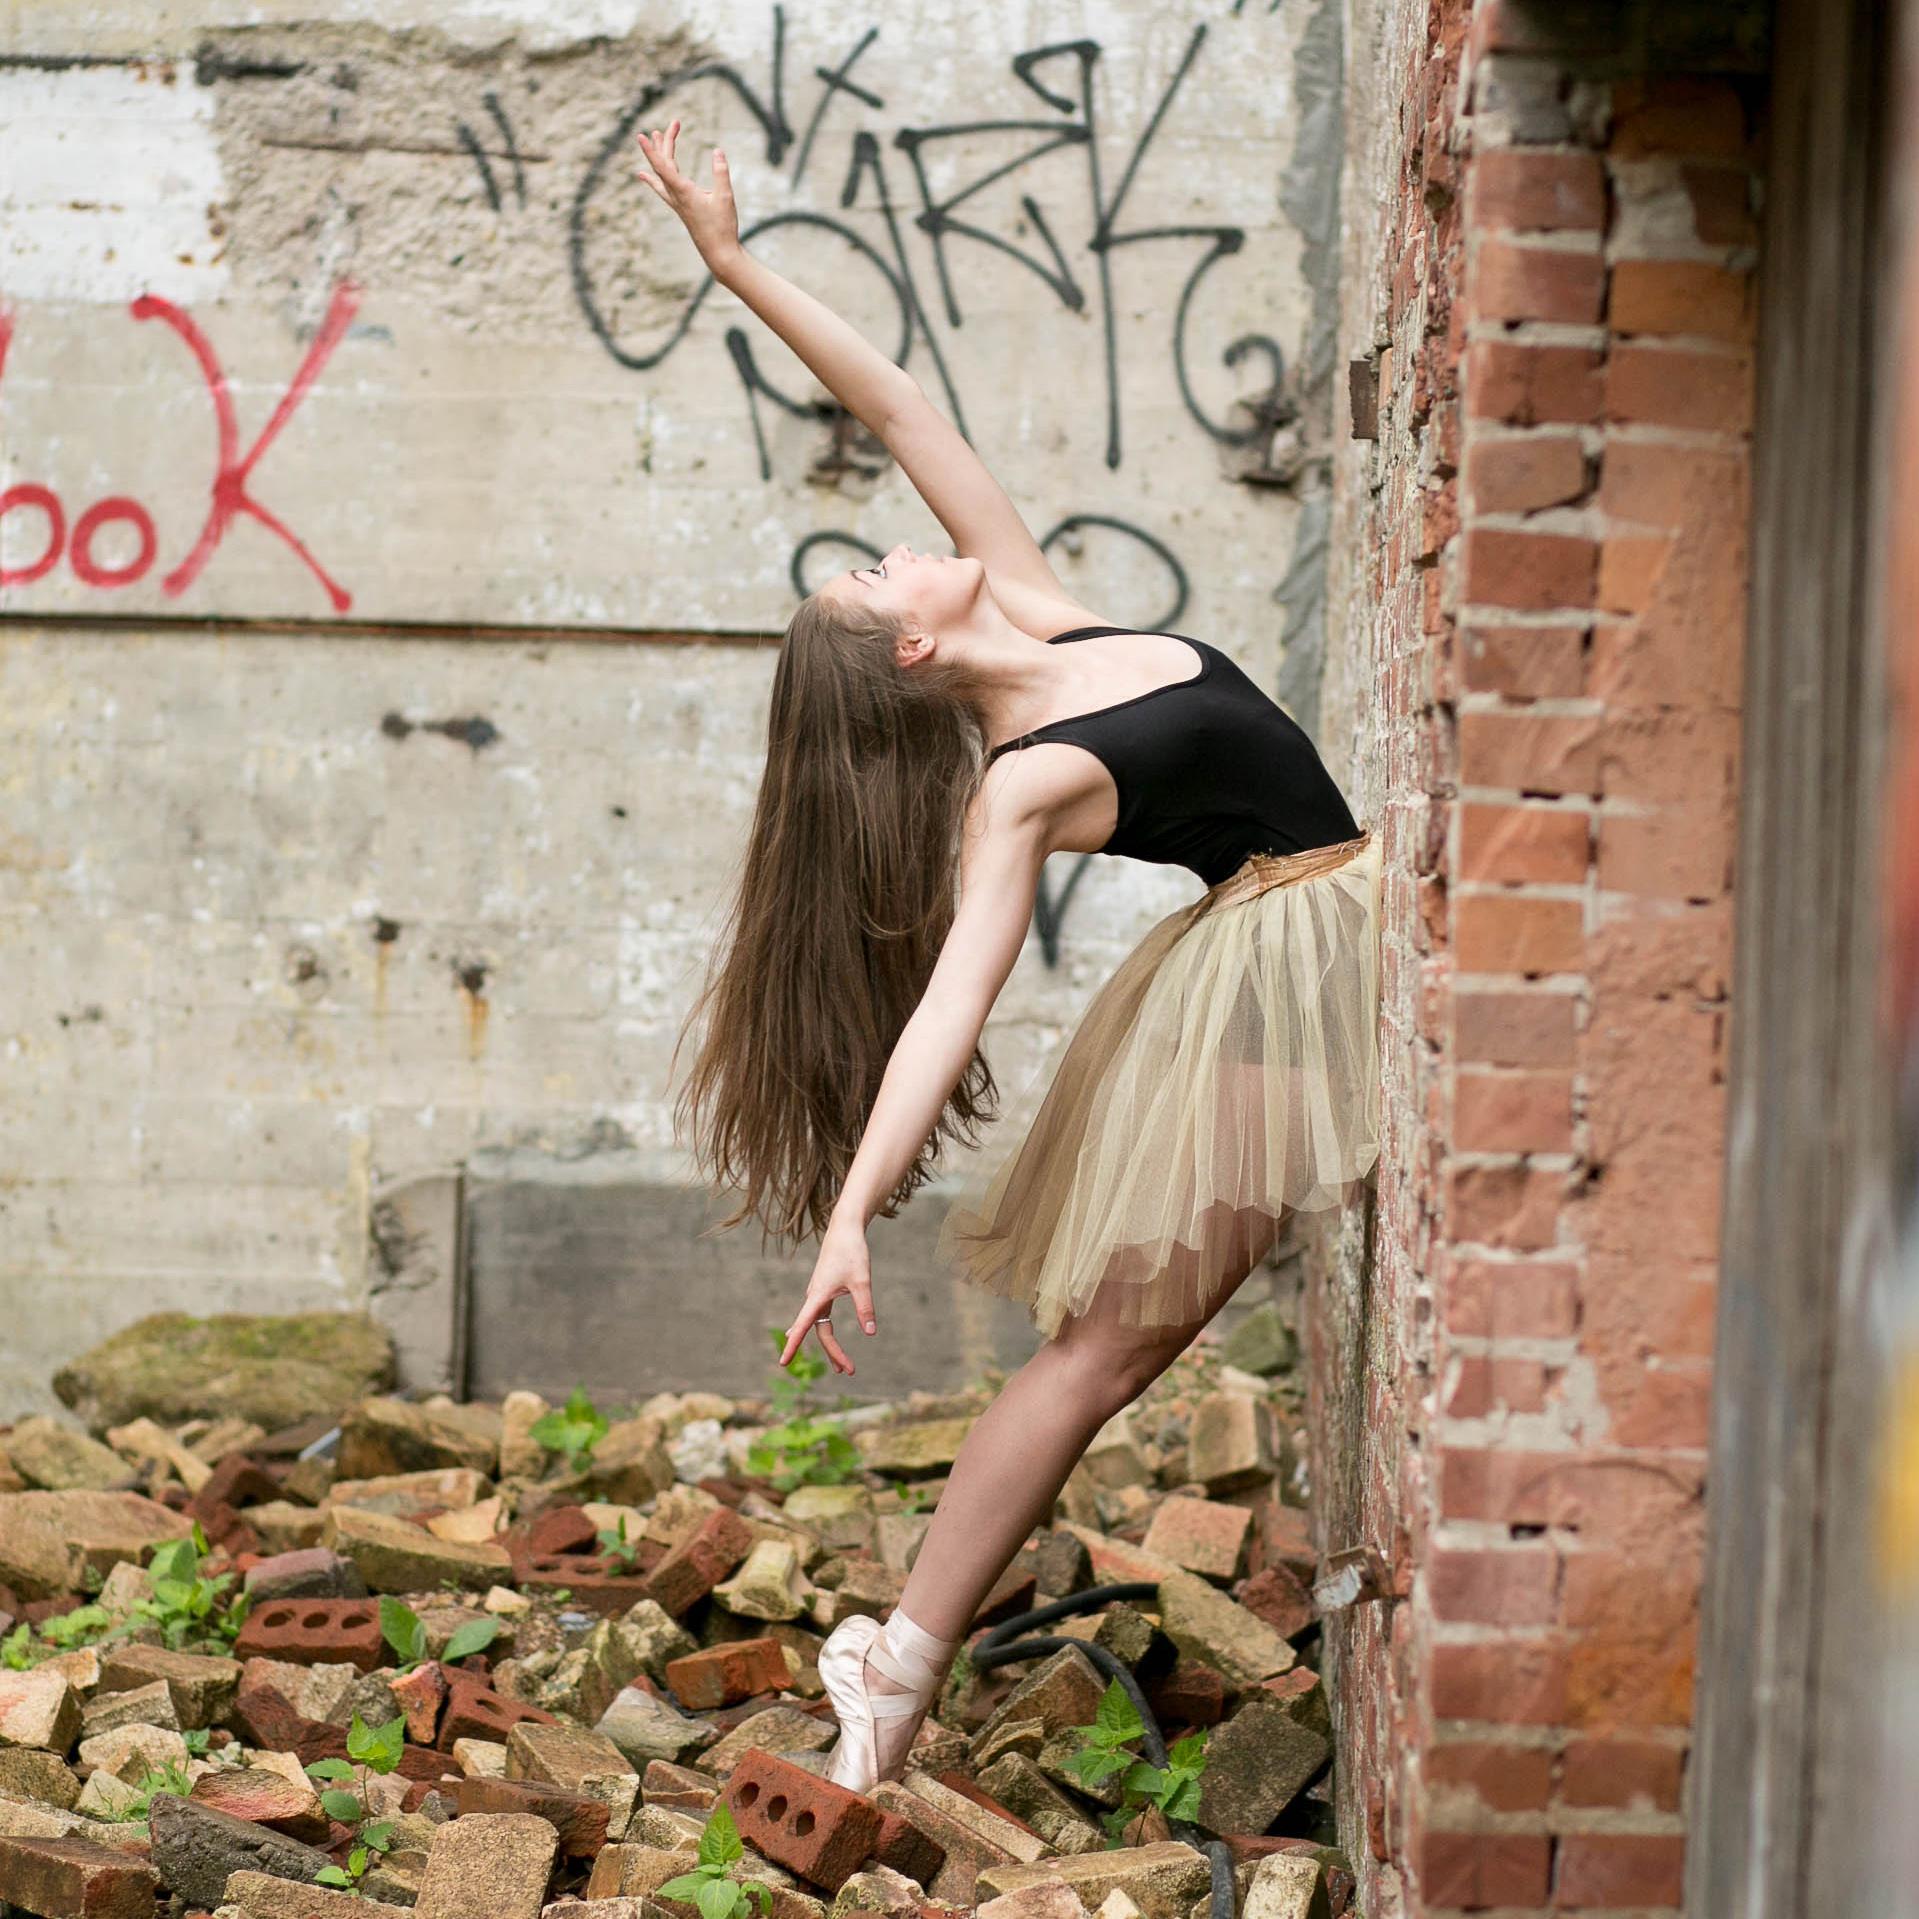 dayton-cincinnati-dance-senior-portrait-photographer-fine-art-square-32.jpg